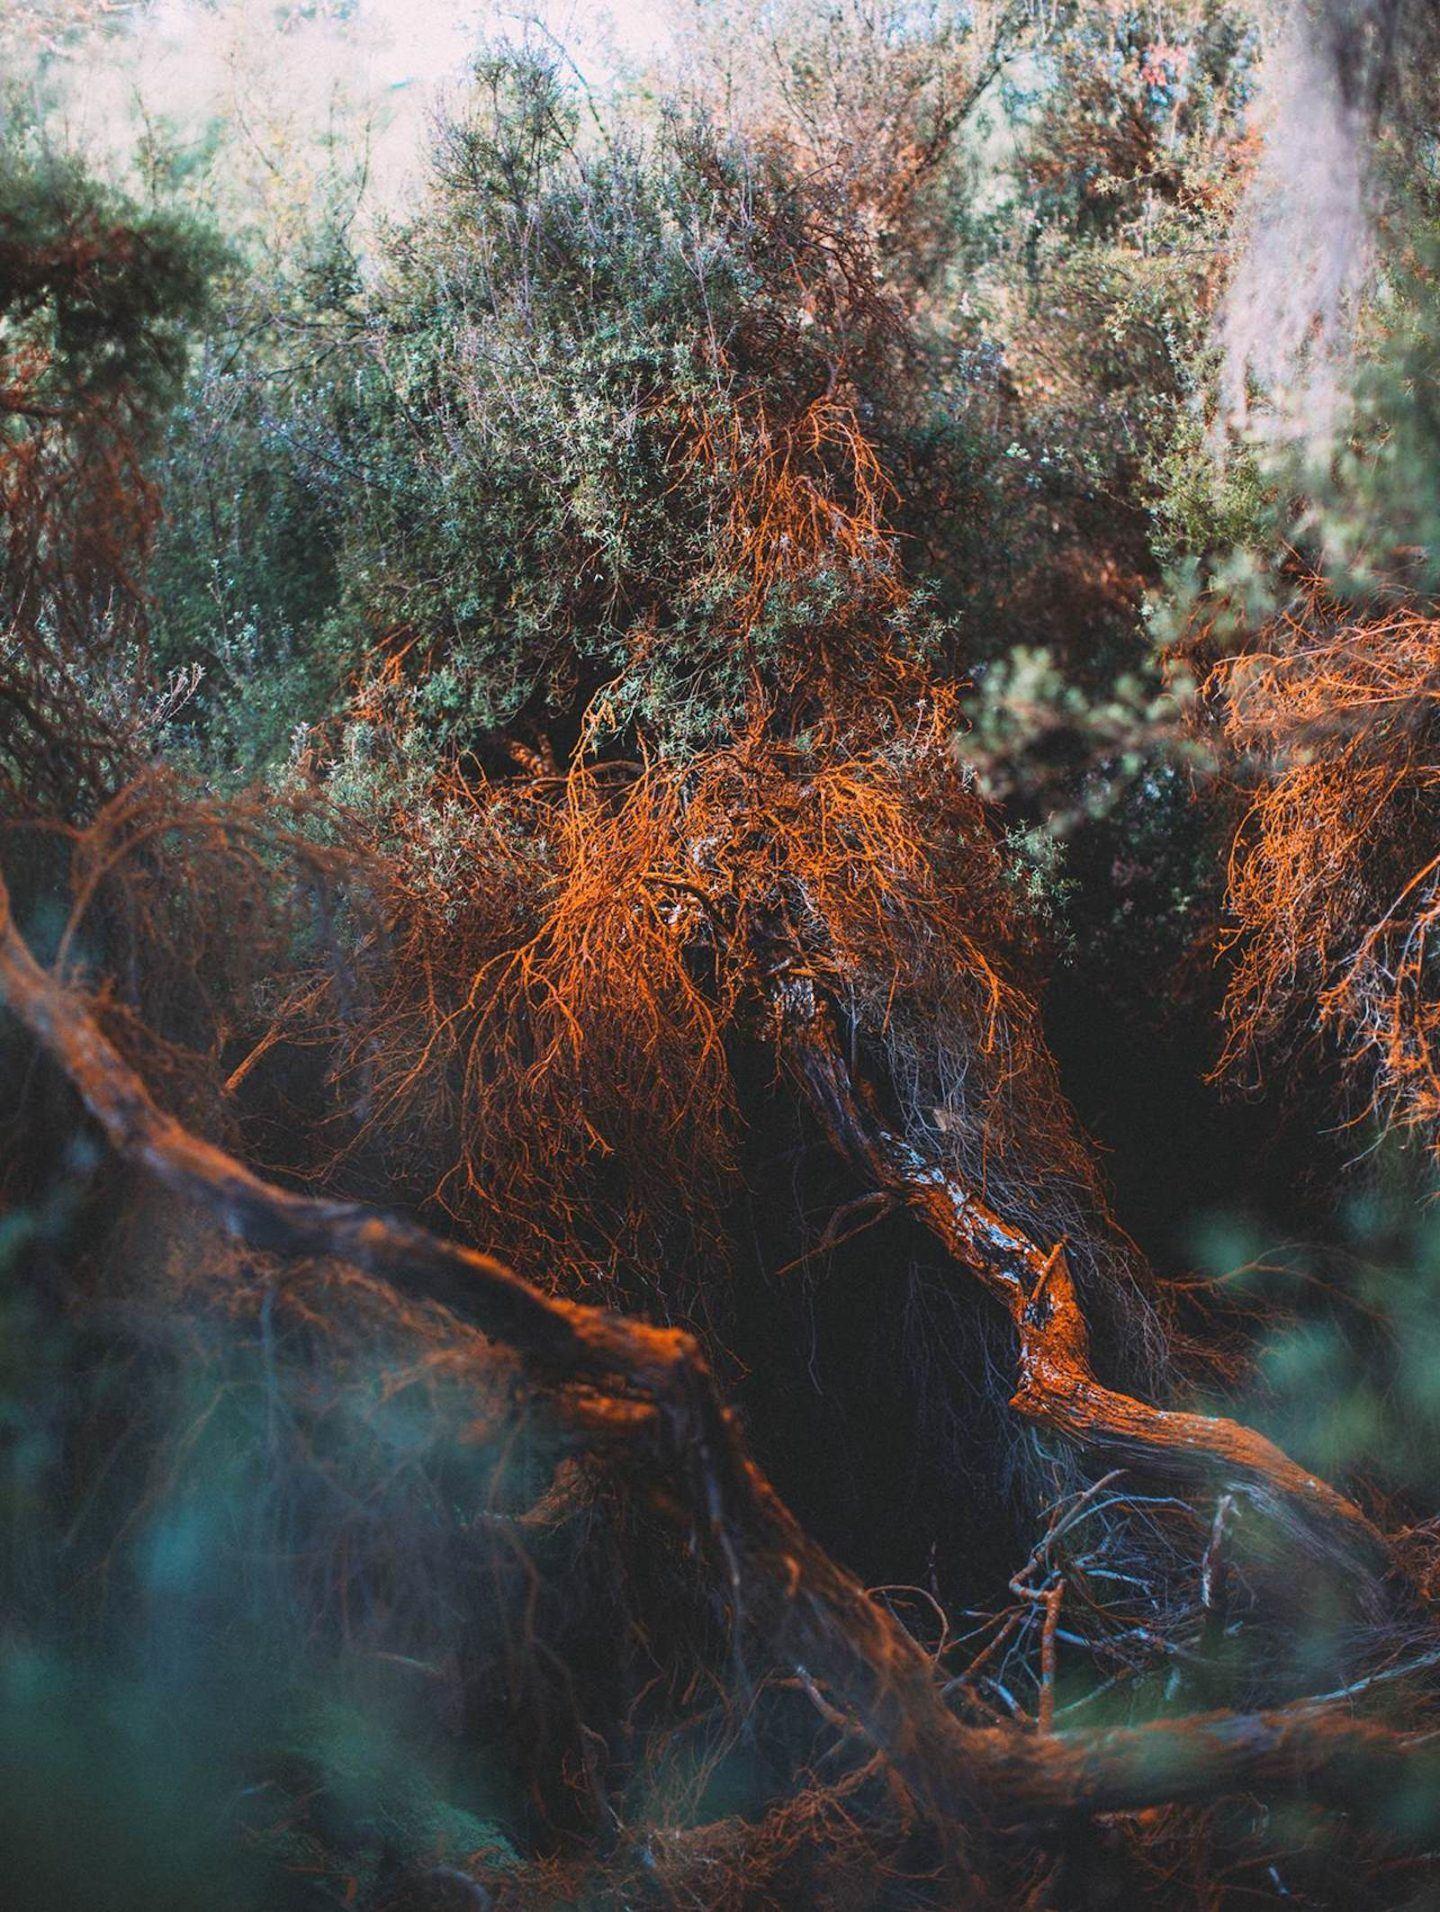 IGNANT-Photography-Chiara-Zonca-It-Devours-009